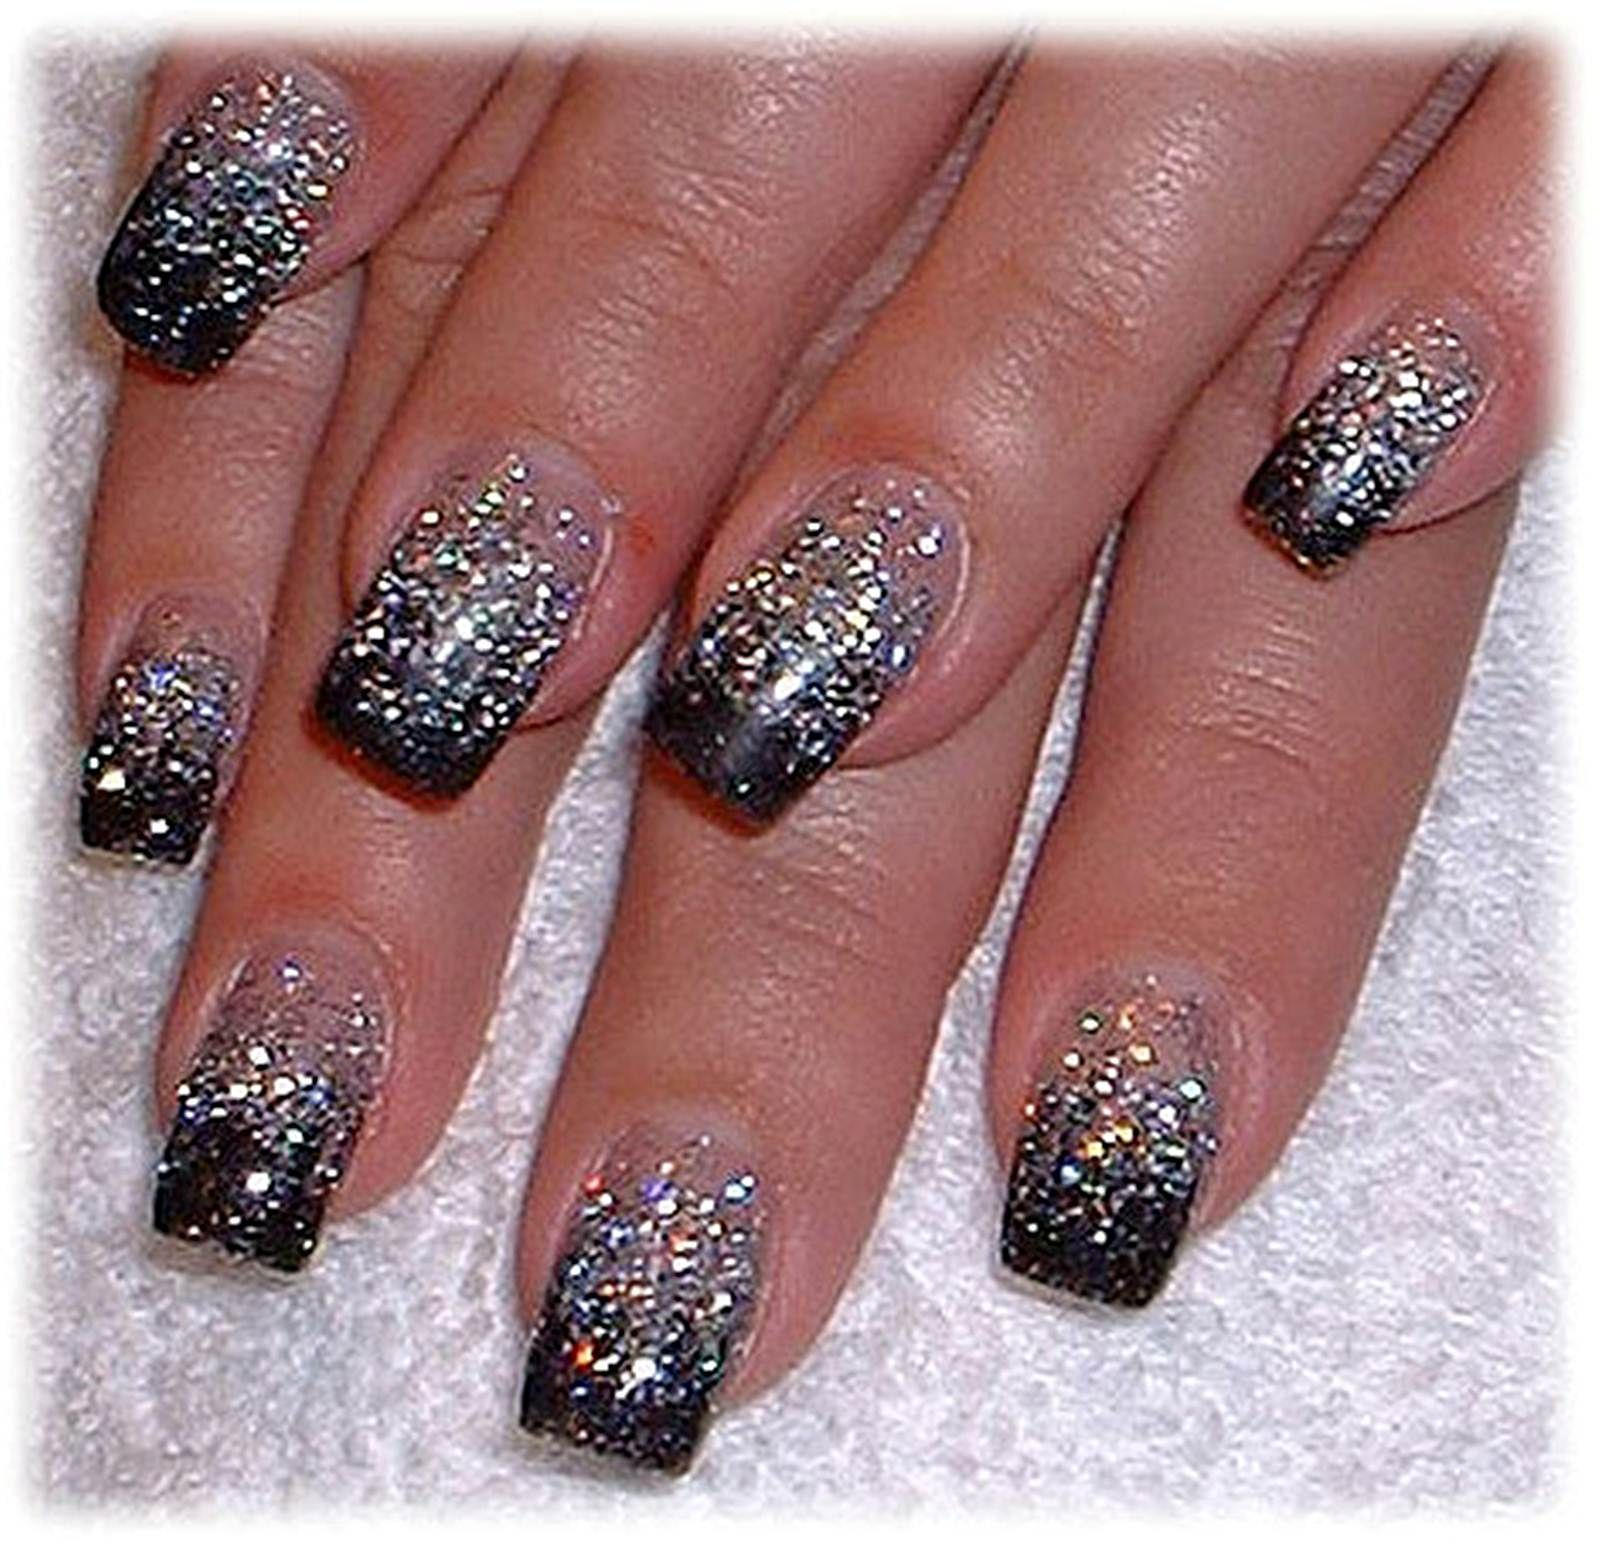 acrylic nail designs glitter tips | Nail\'D IT | Pinterest